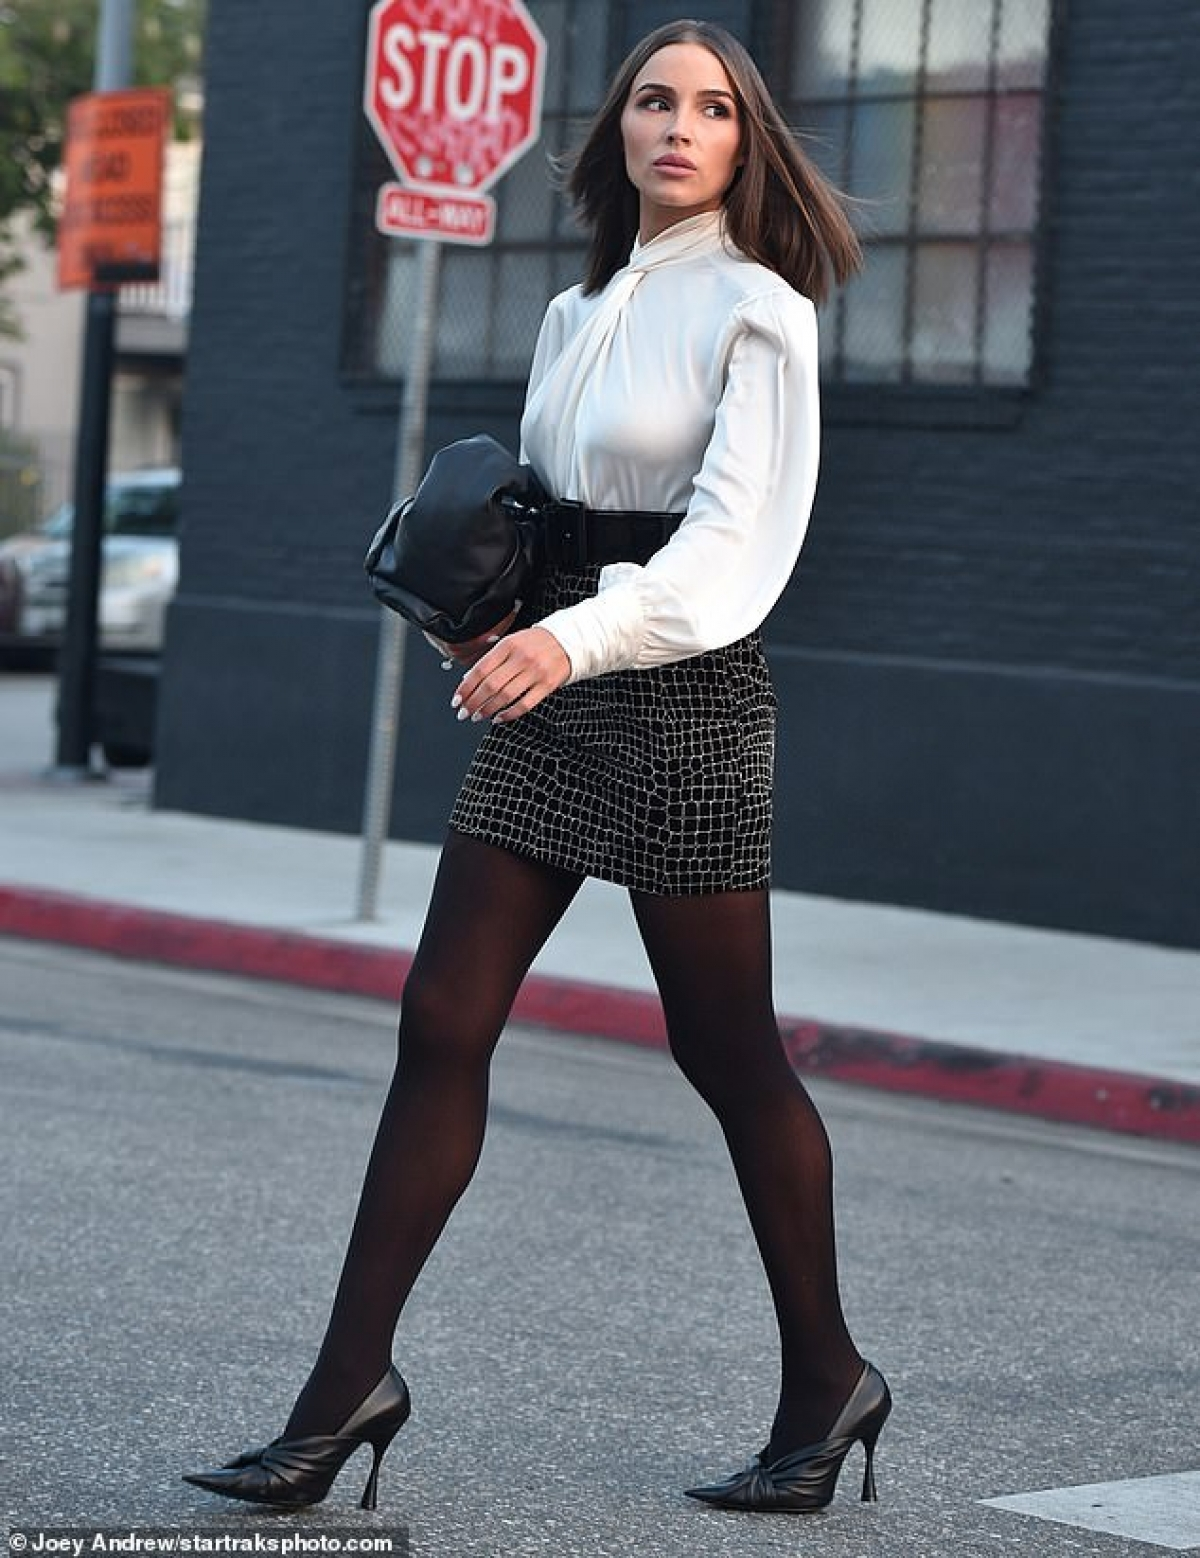 Olivia Culpo xinh đẹp trong buổi chụp hình quảng cáo ở Los Angeles vừa qua.